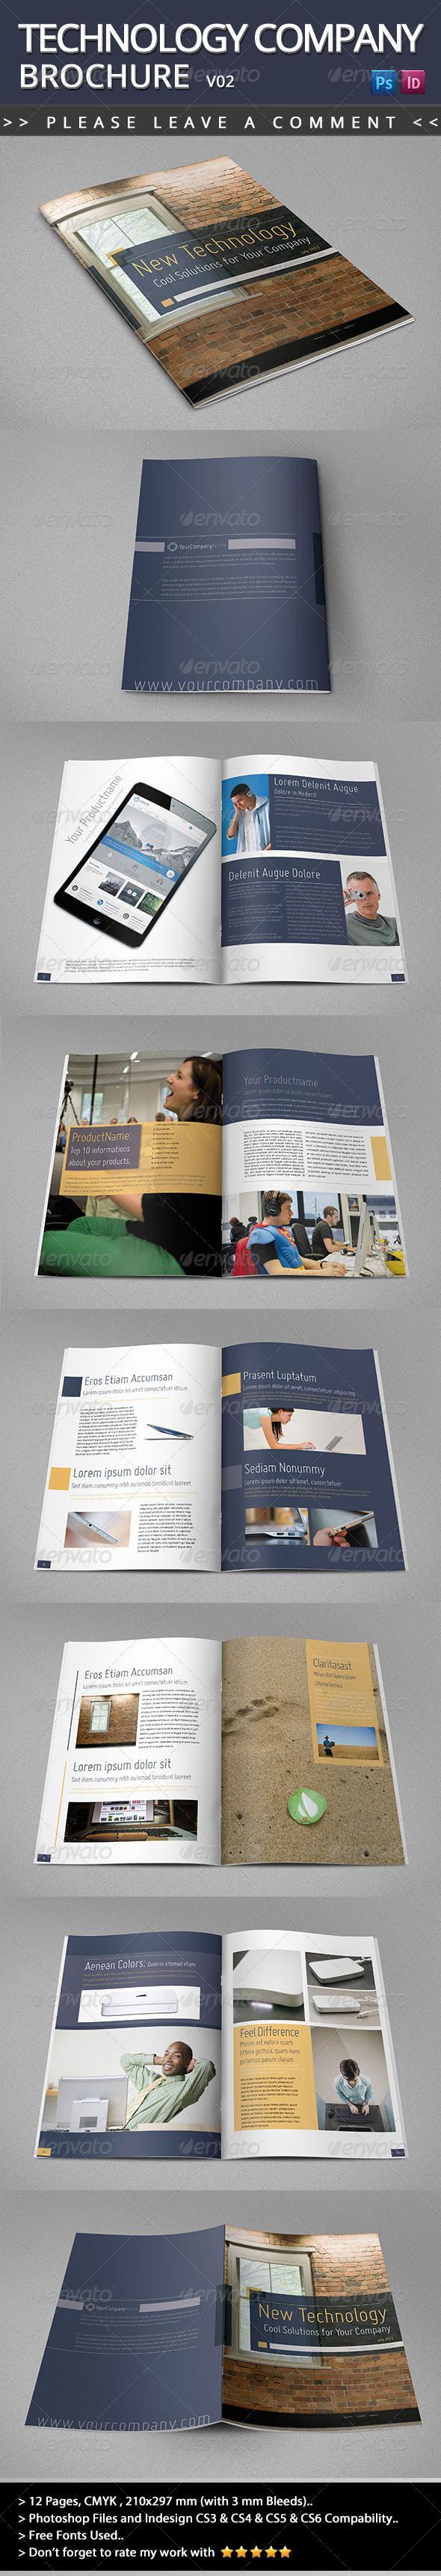 GraphicRiver Technology Company Brochure V02 5139087